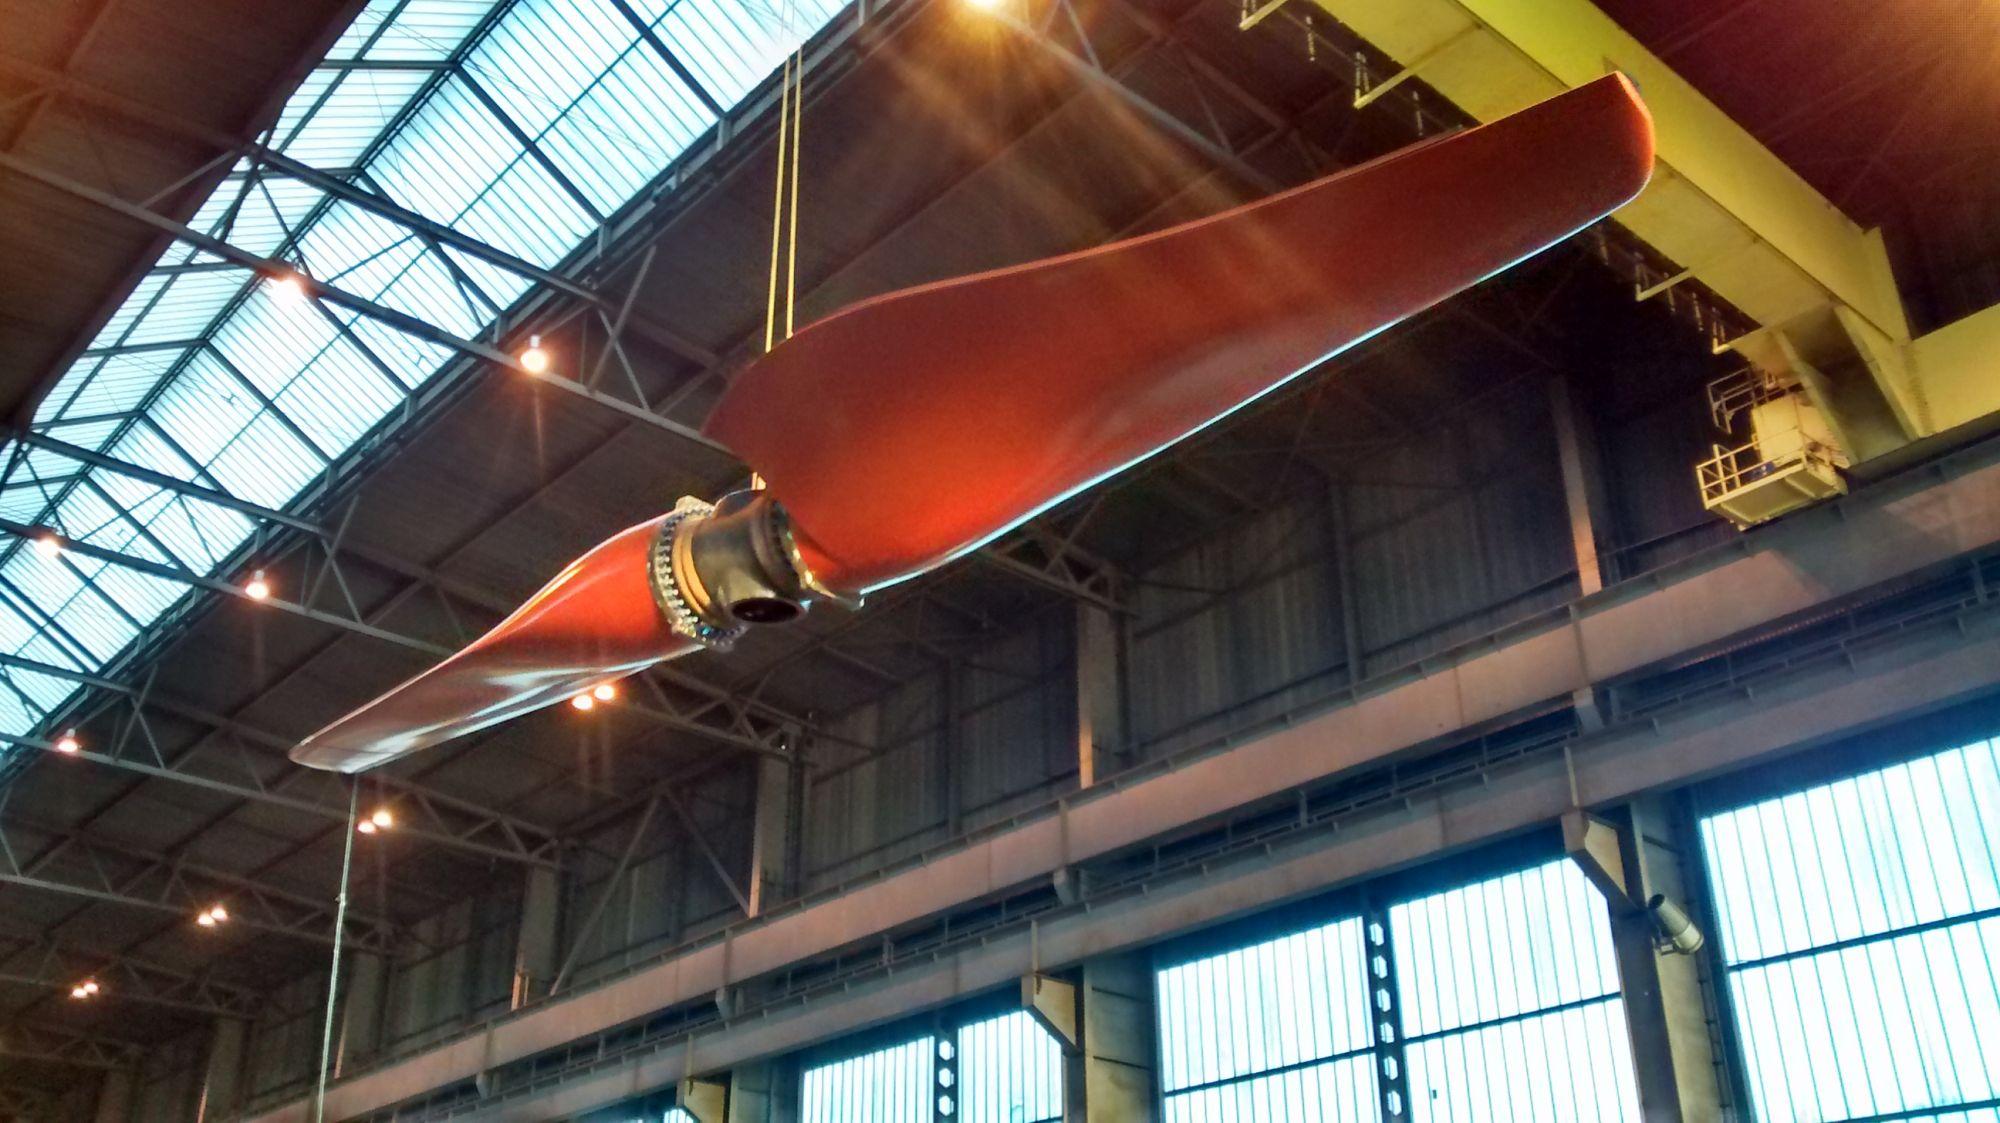 Scott Renewable Tidal Turbine Blades